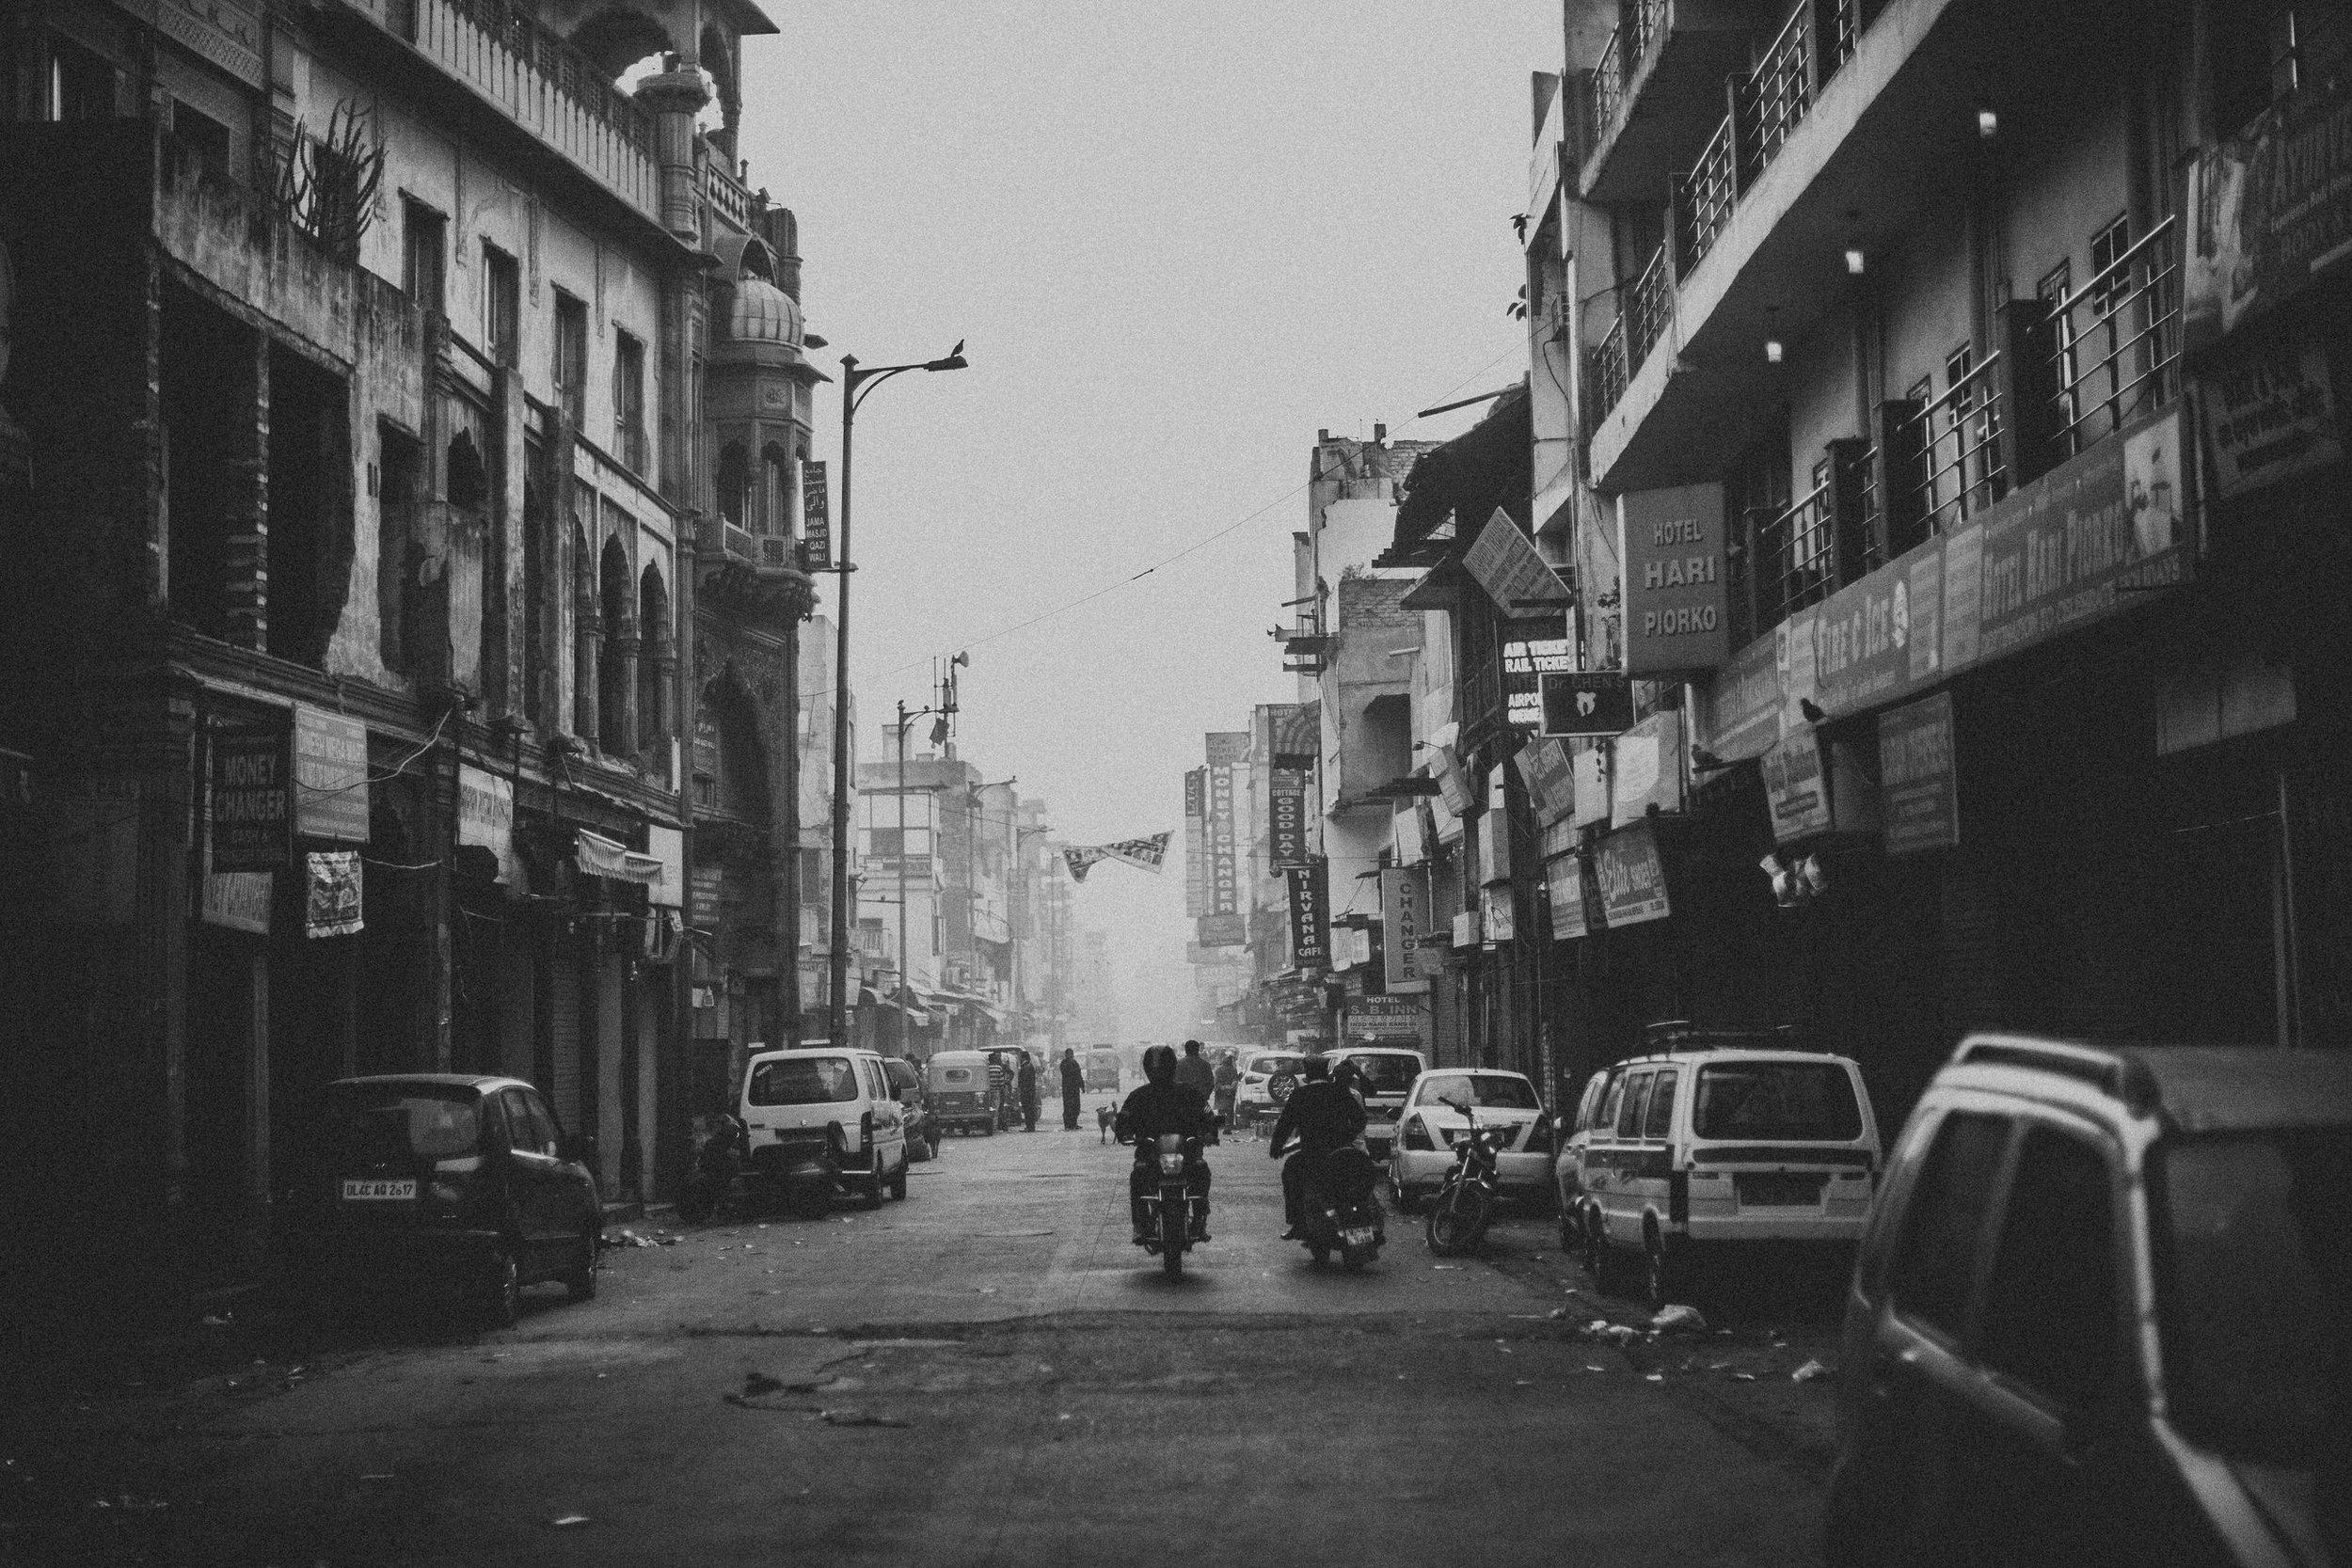 AFFOB_INDIA_20151142.JPG